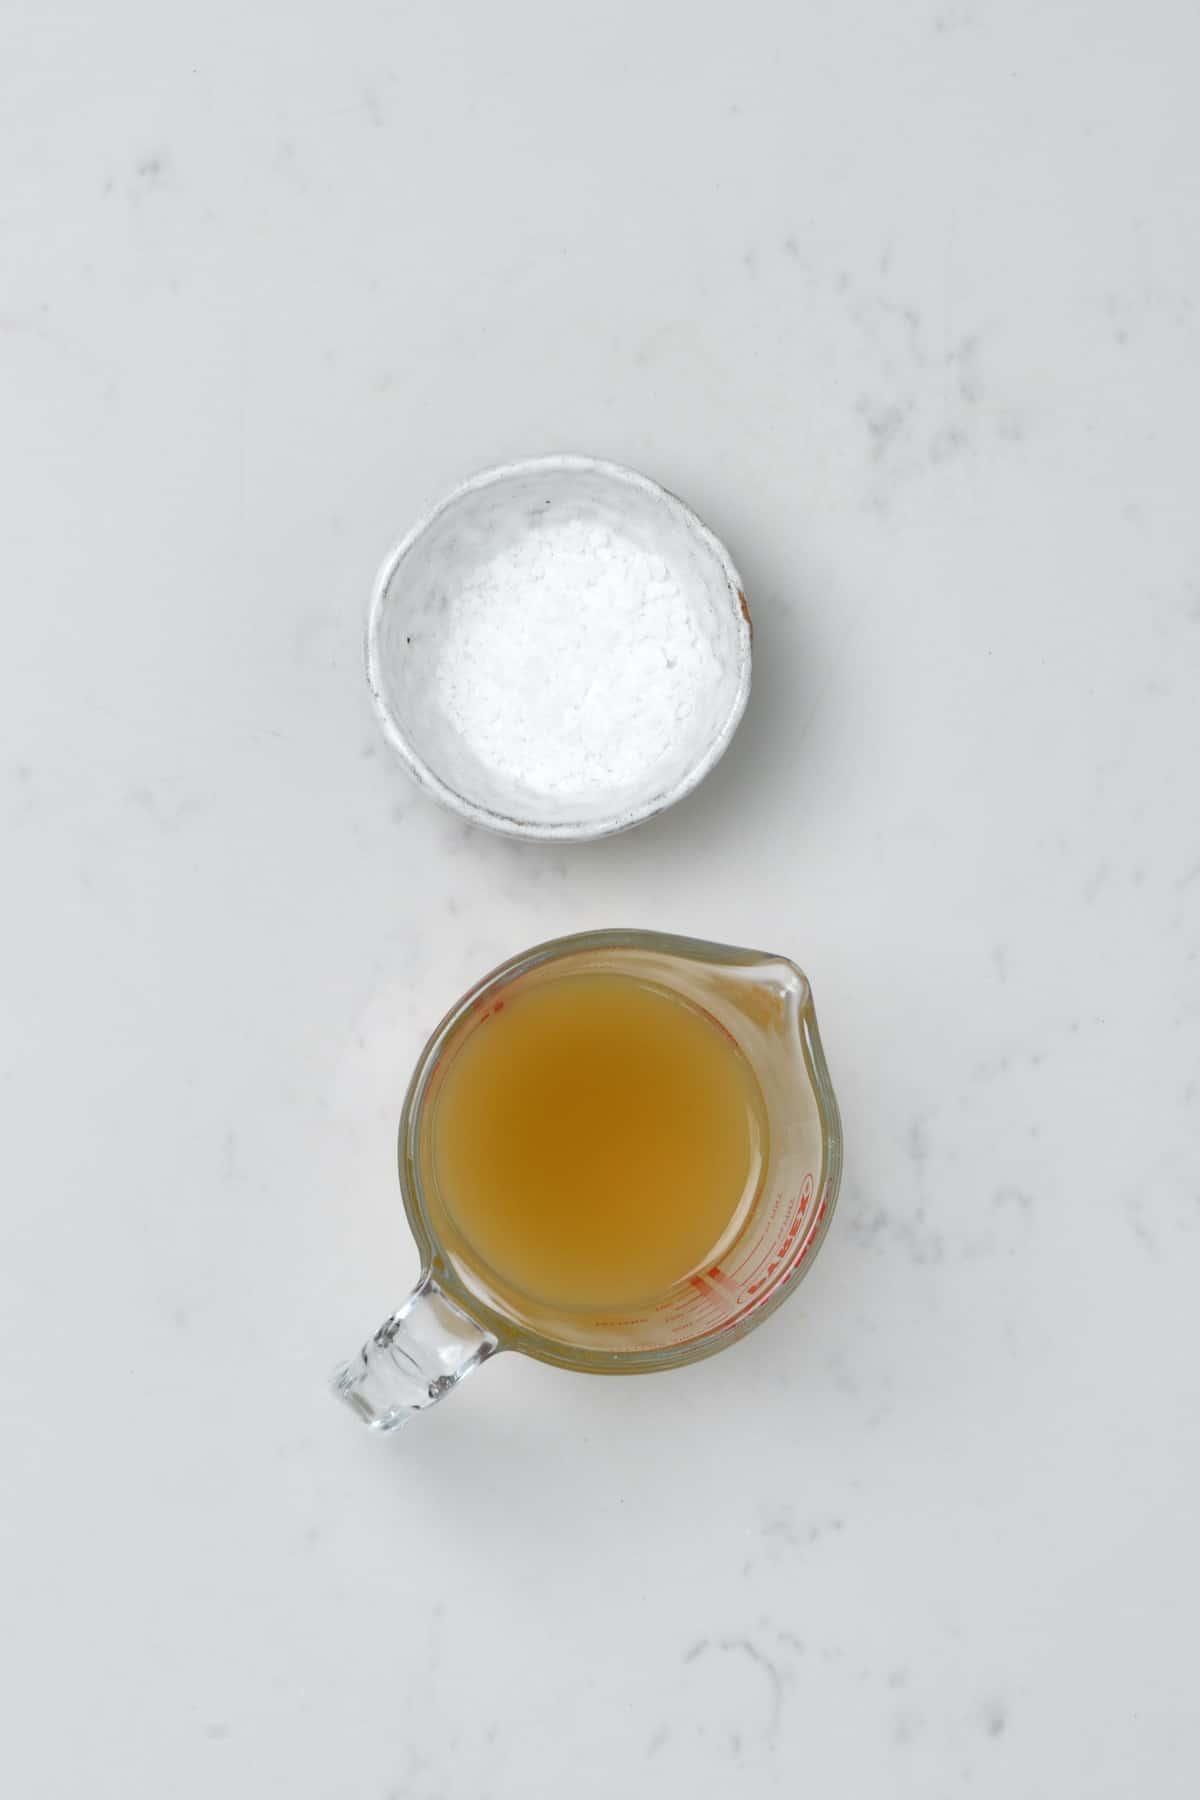 Salt and soybean cooking liquid